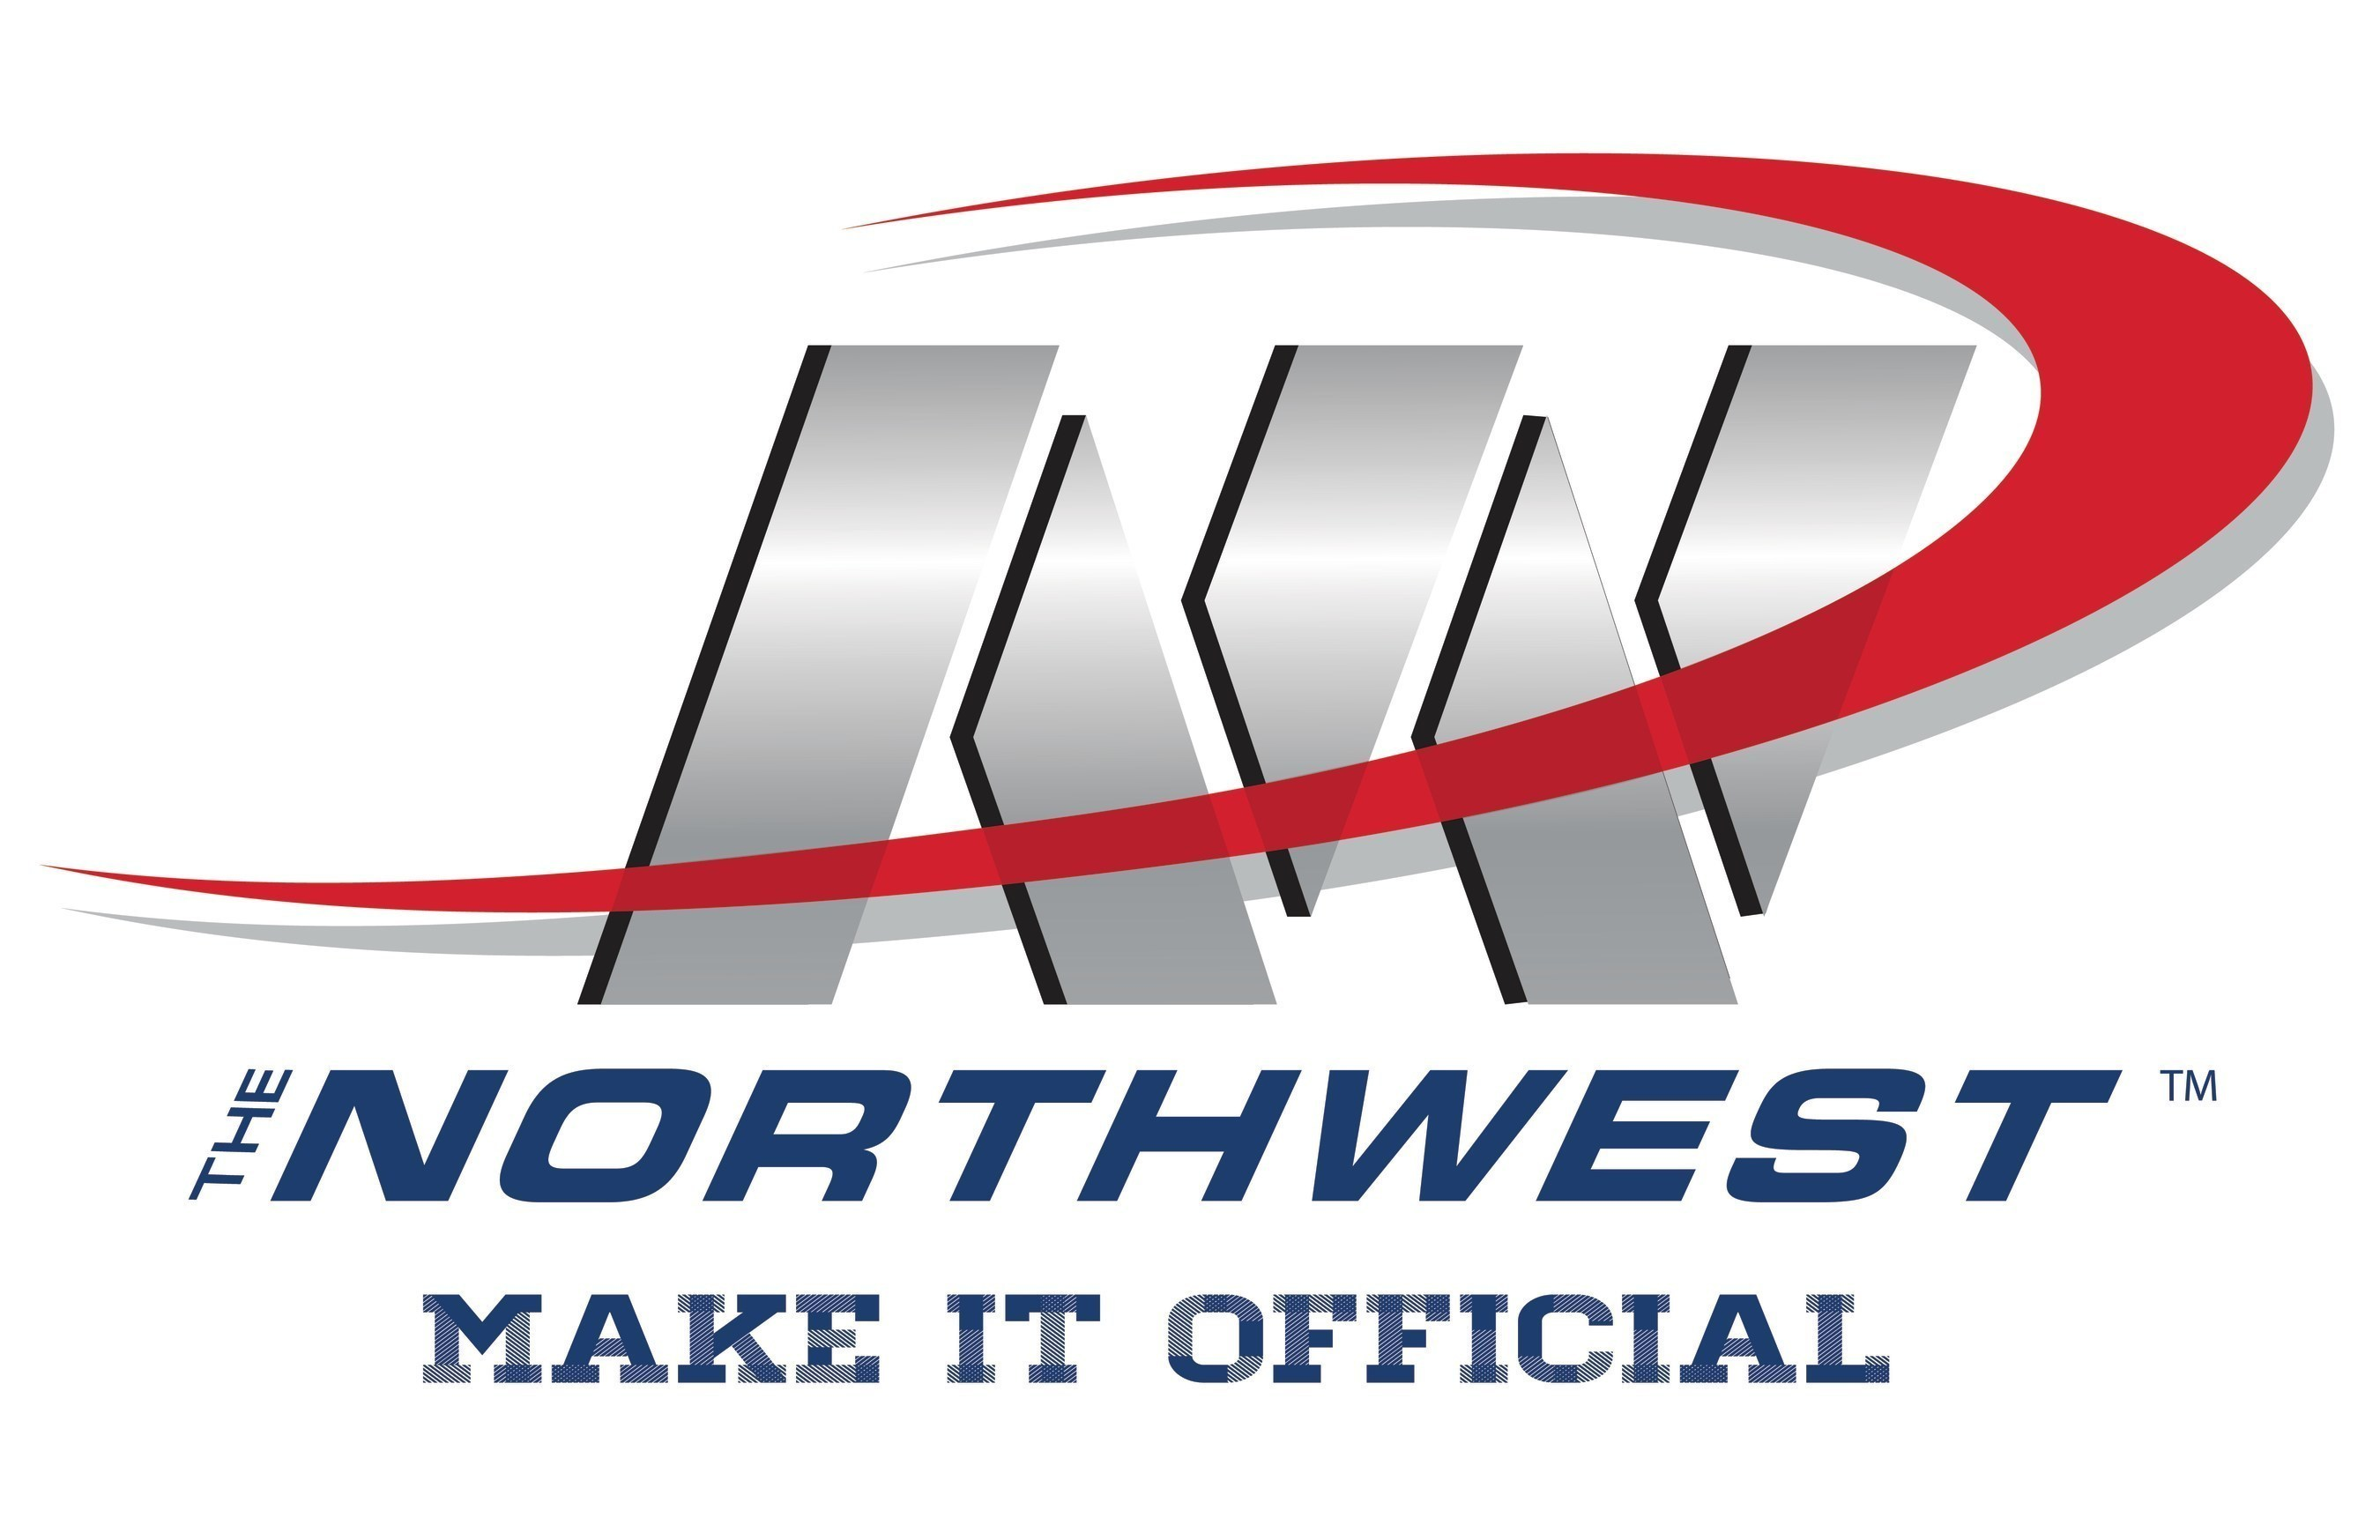 The Northwest (PRNewsFoto/The Northwest Company)